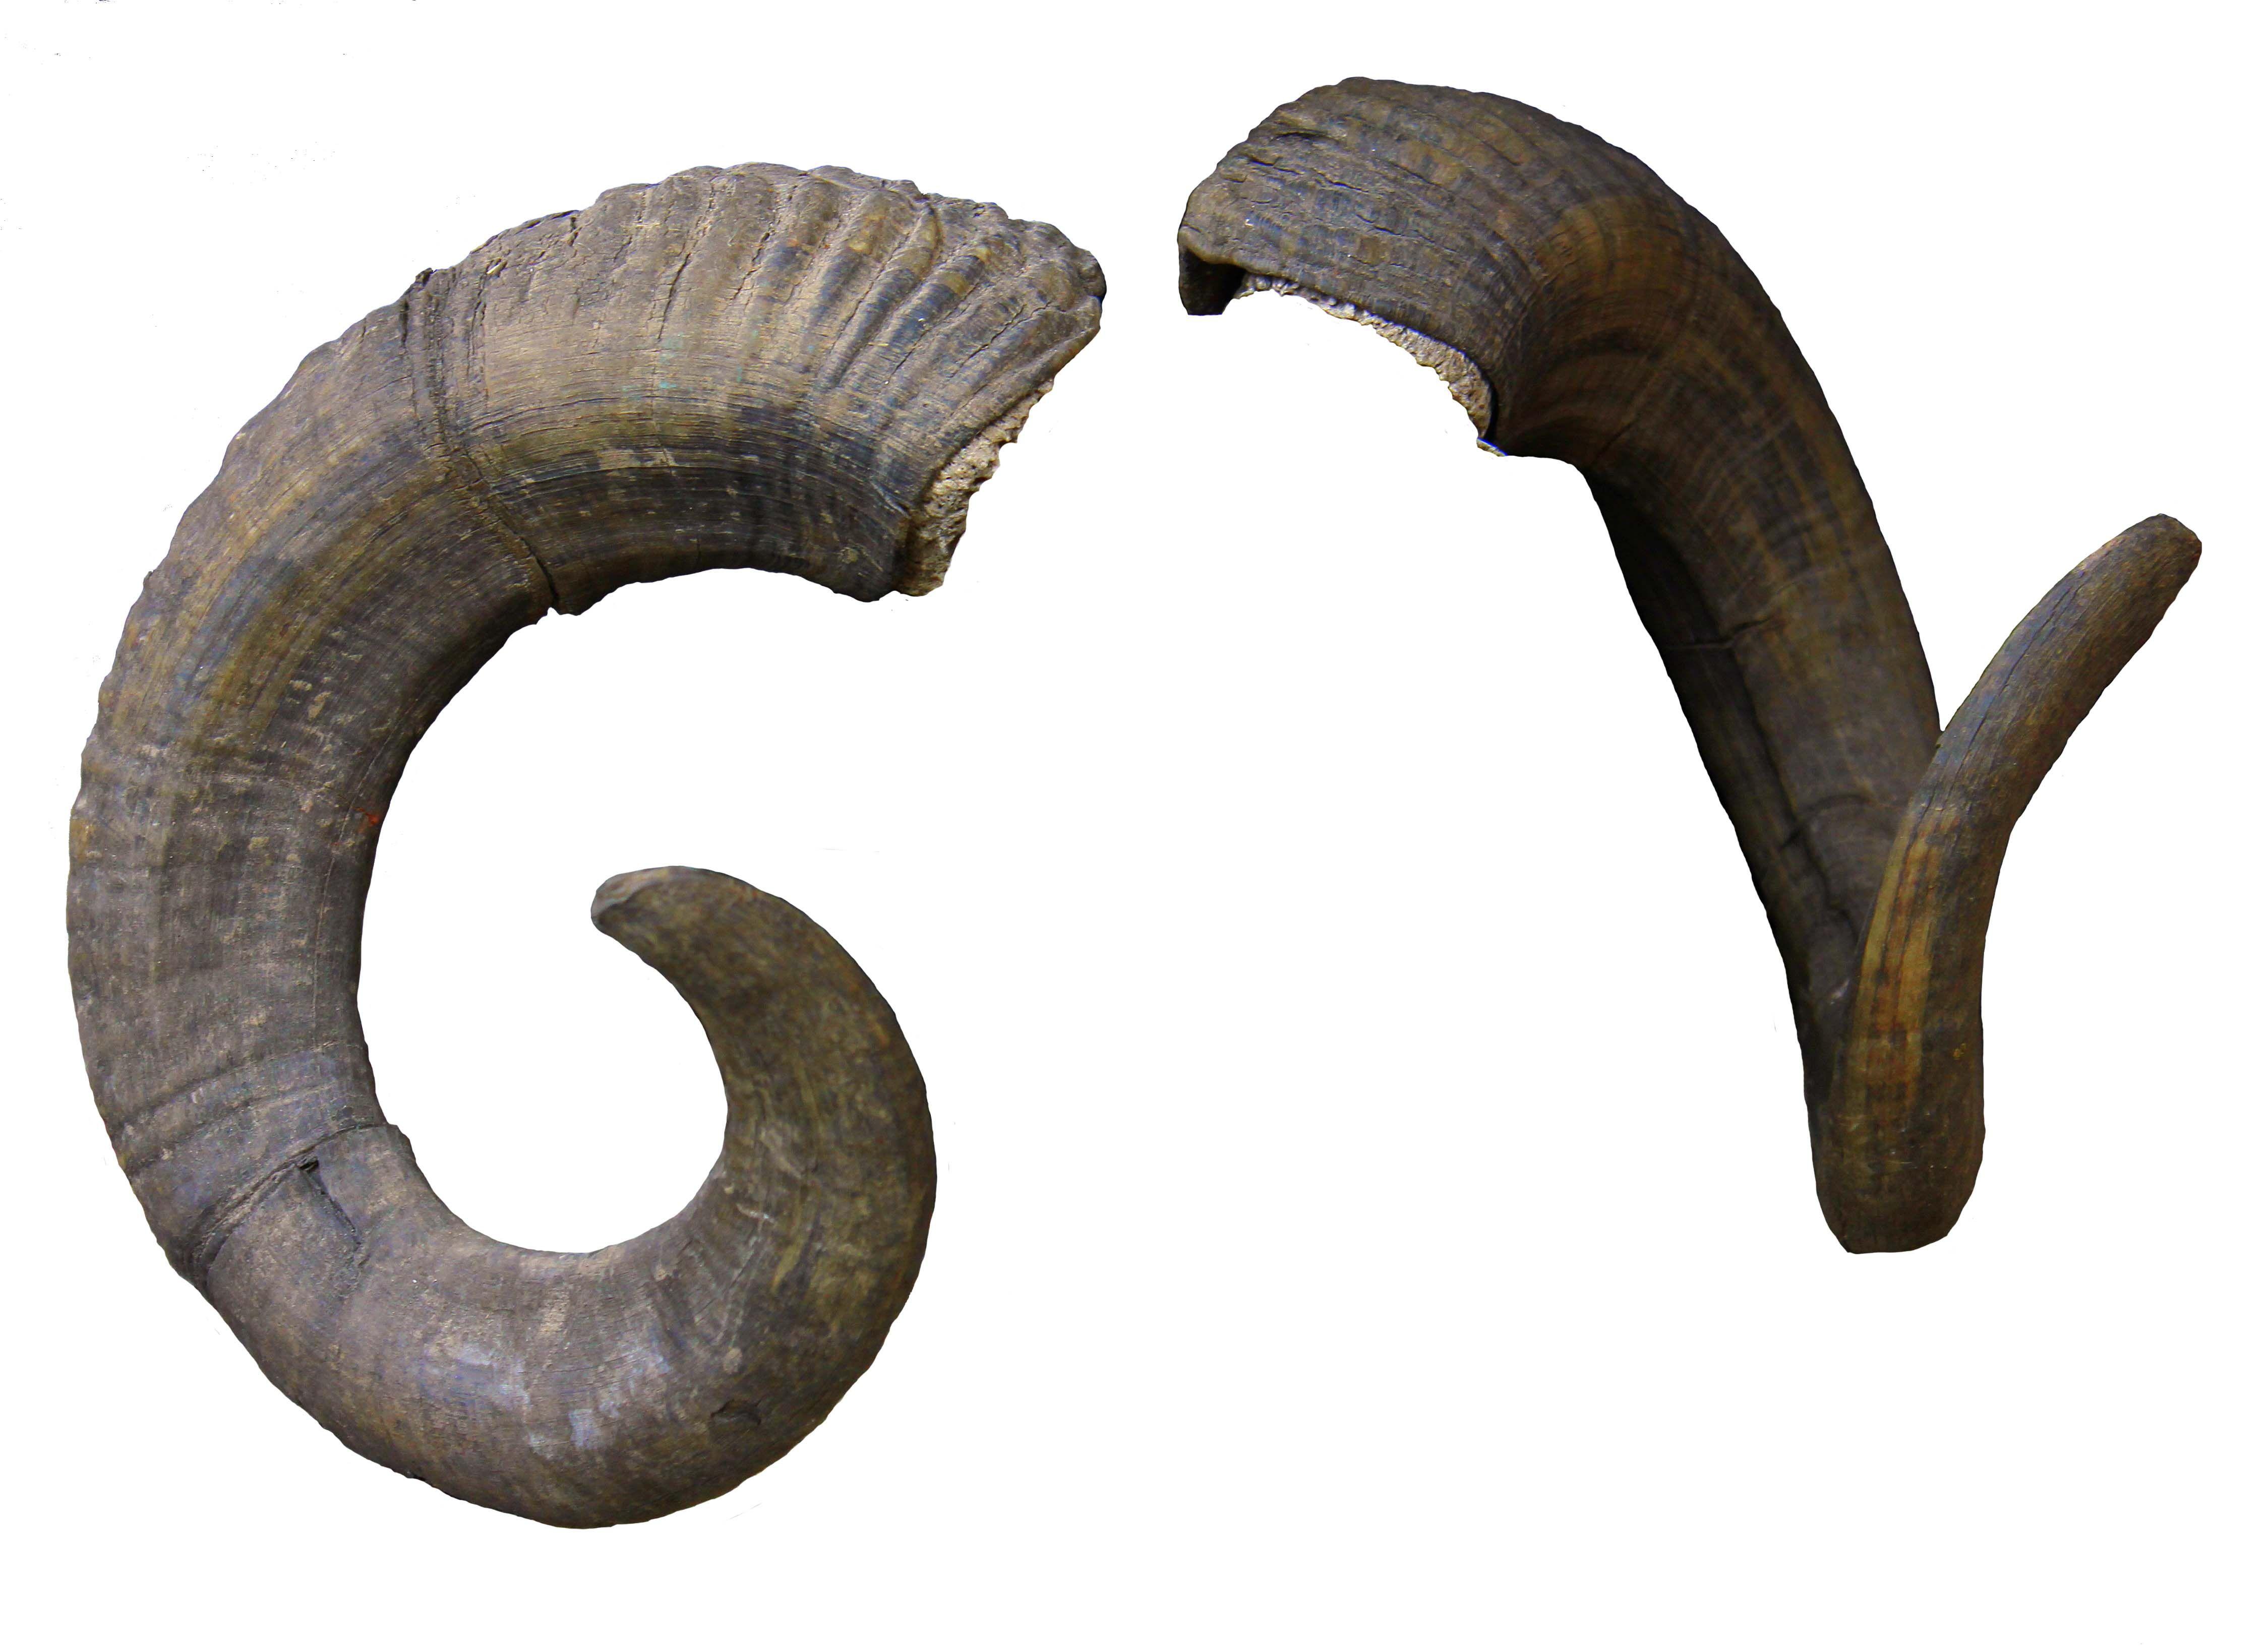 horns - Buscar con Google | Cuernos | Pinterest | Horn and ... Horns